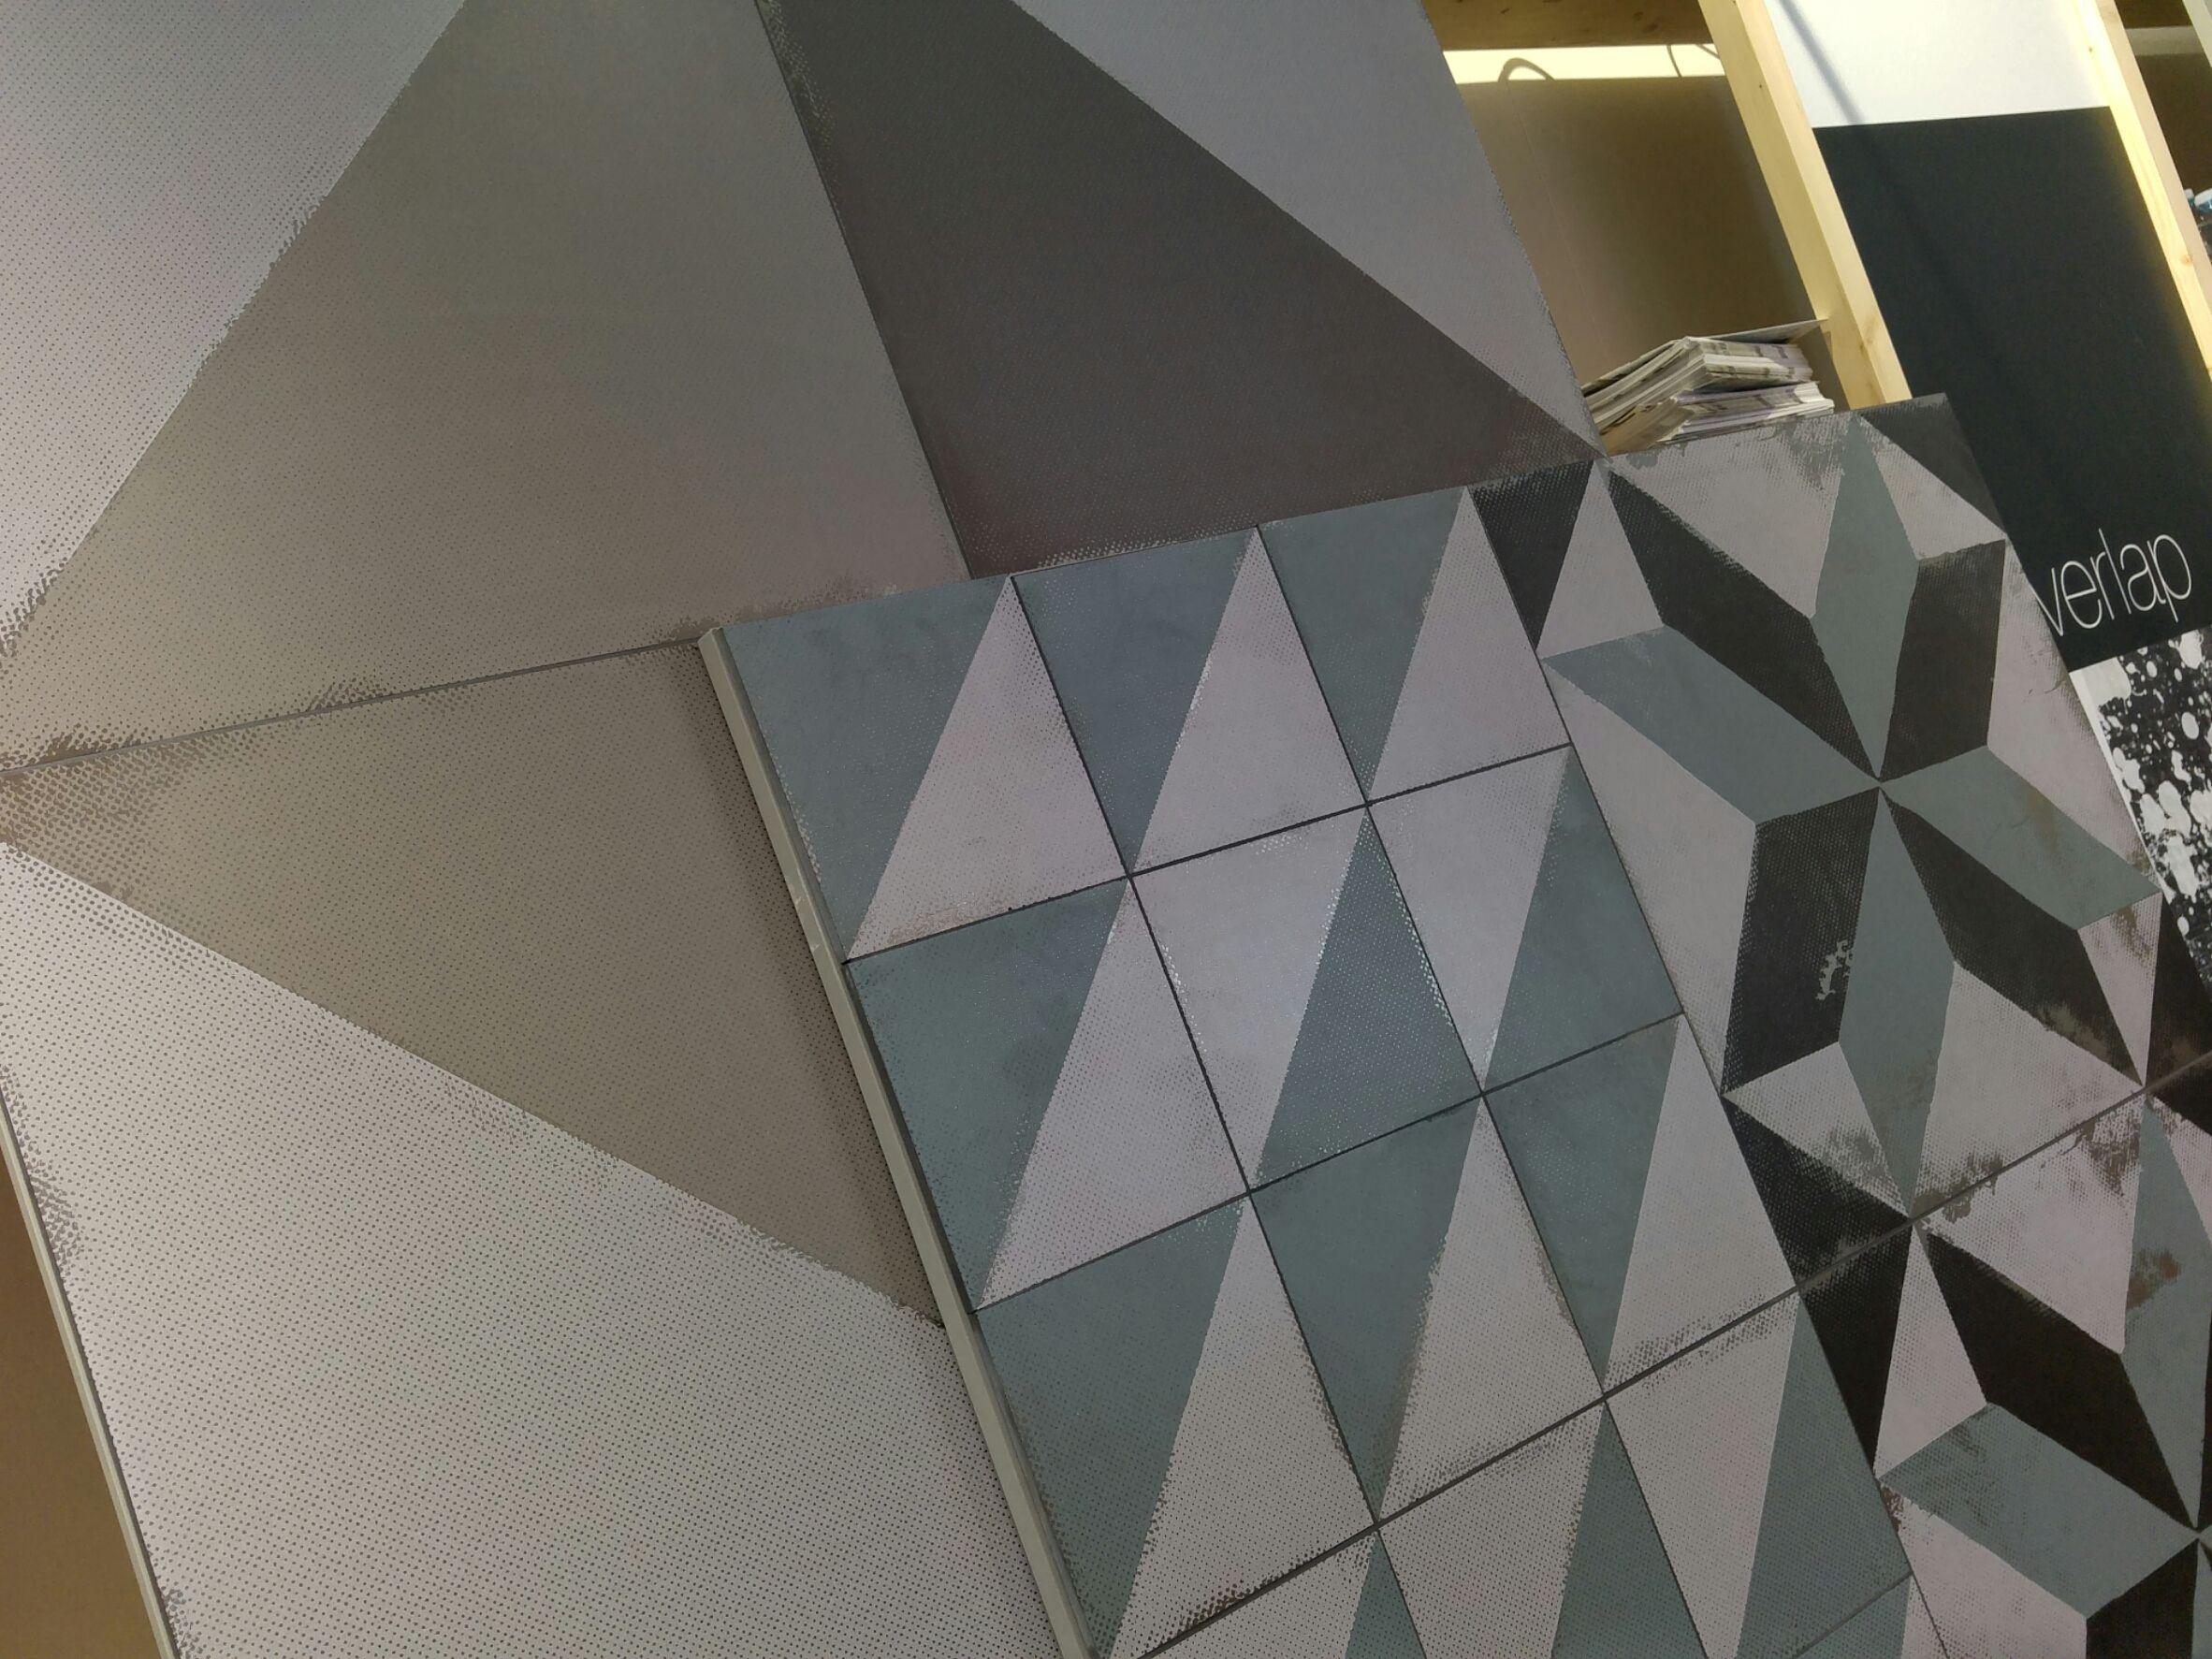 Superfici Matt e ricerca sul design da Unica by Target Studio. #Tortona  #iSaloni #milanoDesignWeek #MCaroundSaloni